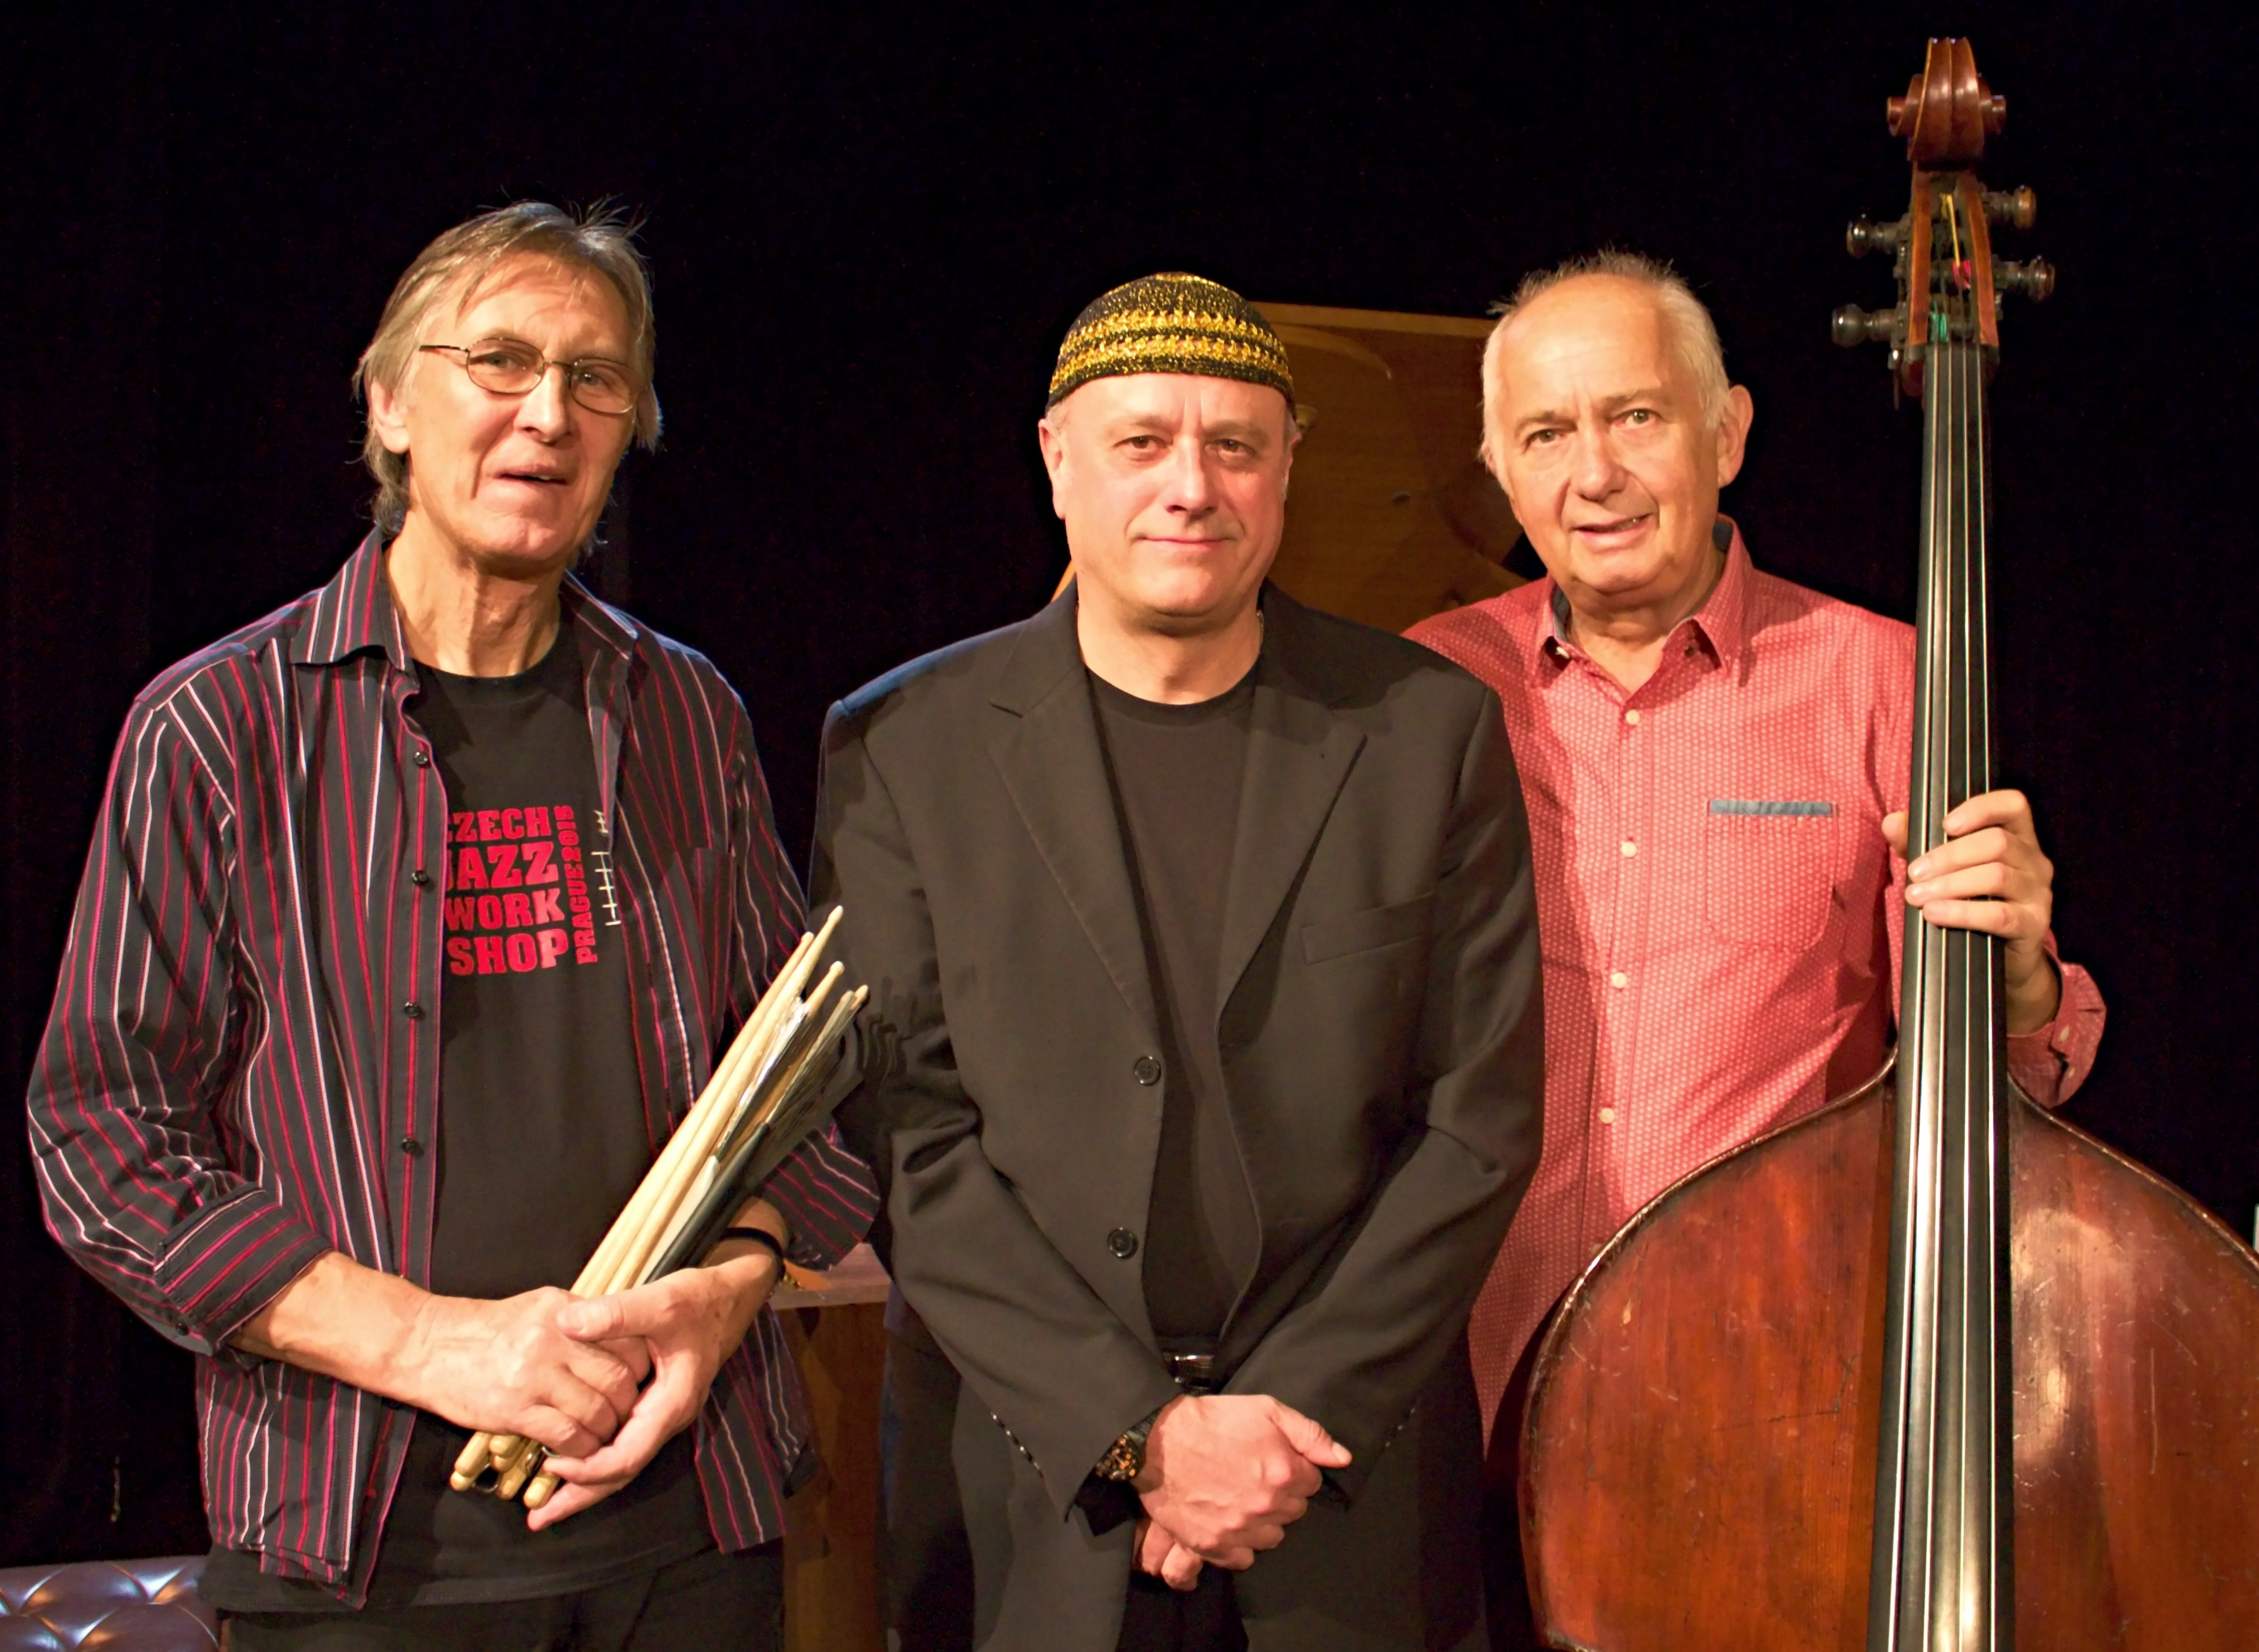 Roberto Magris with the MUH Trio, with Frantisek Uhlir and Jaromir Helesic